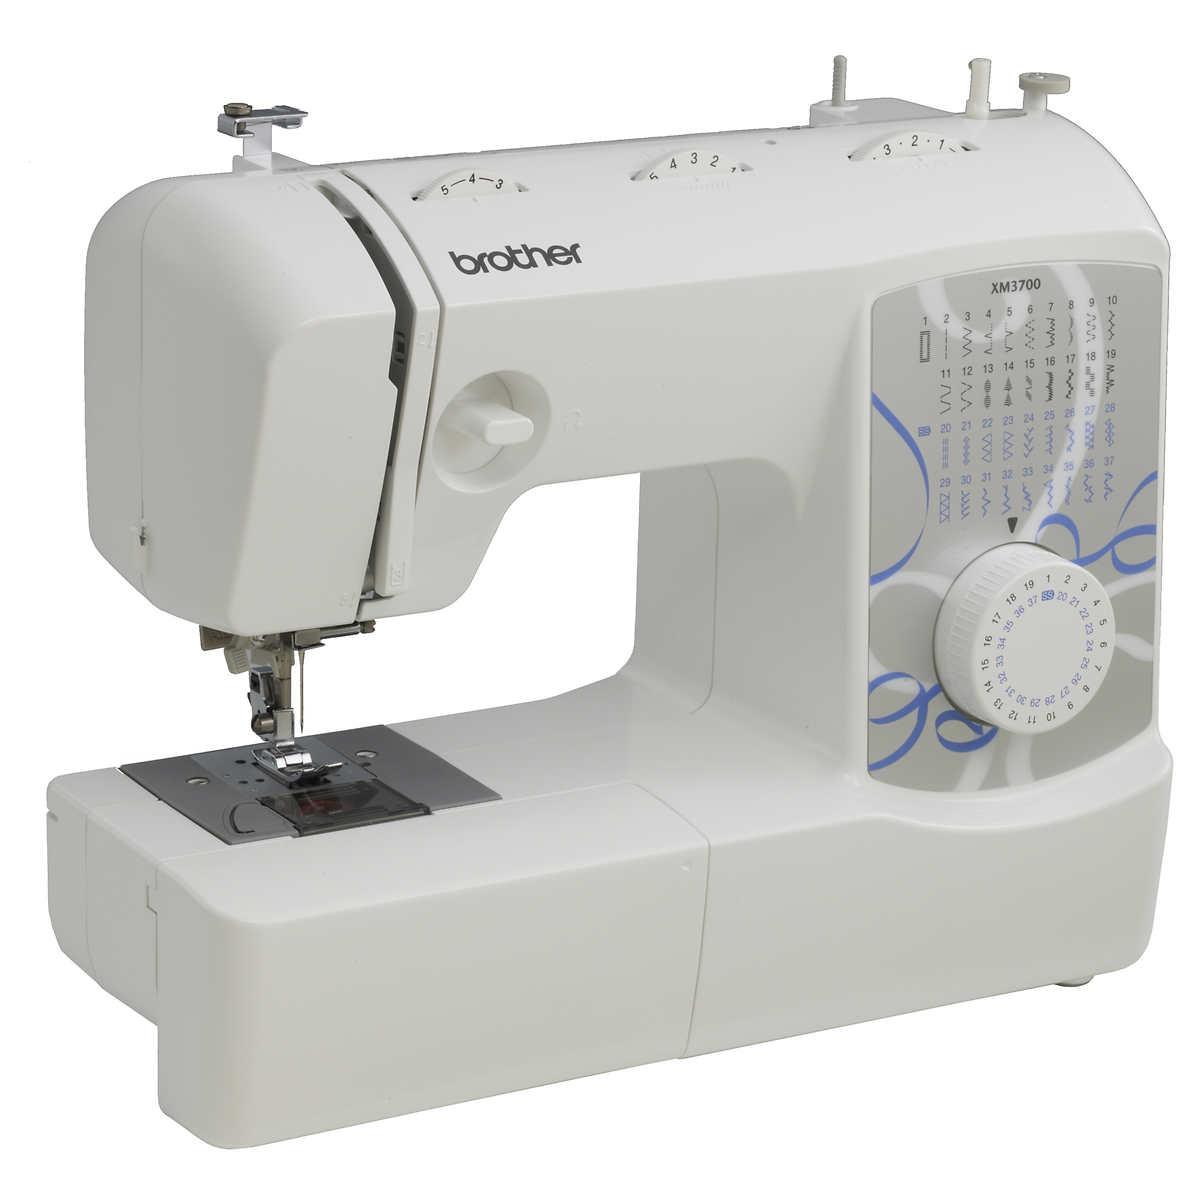 Brother XM3700 37-Stitch Free Arm Sewing Machine